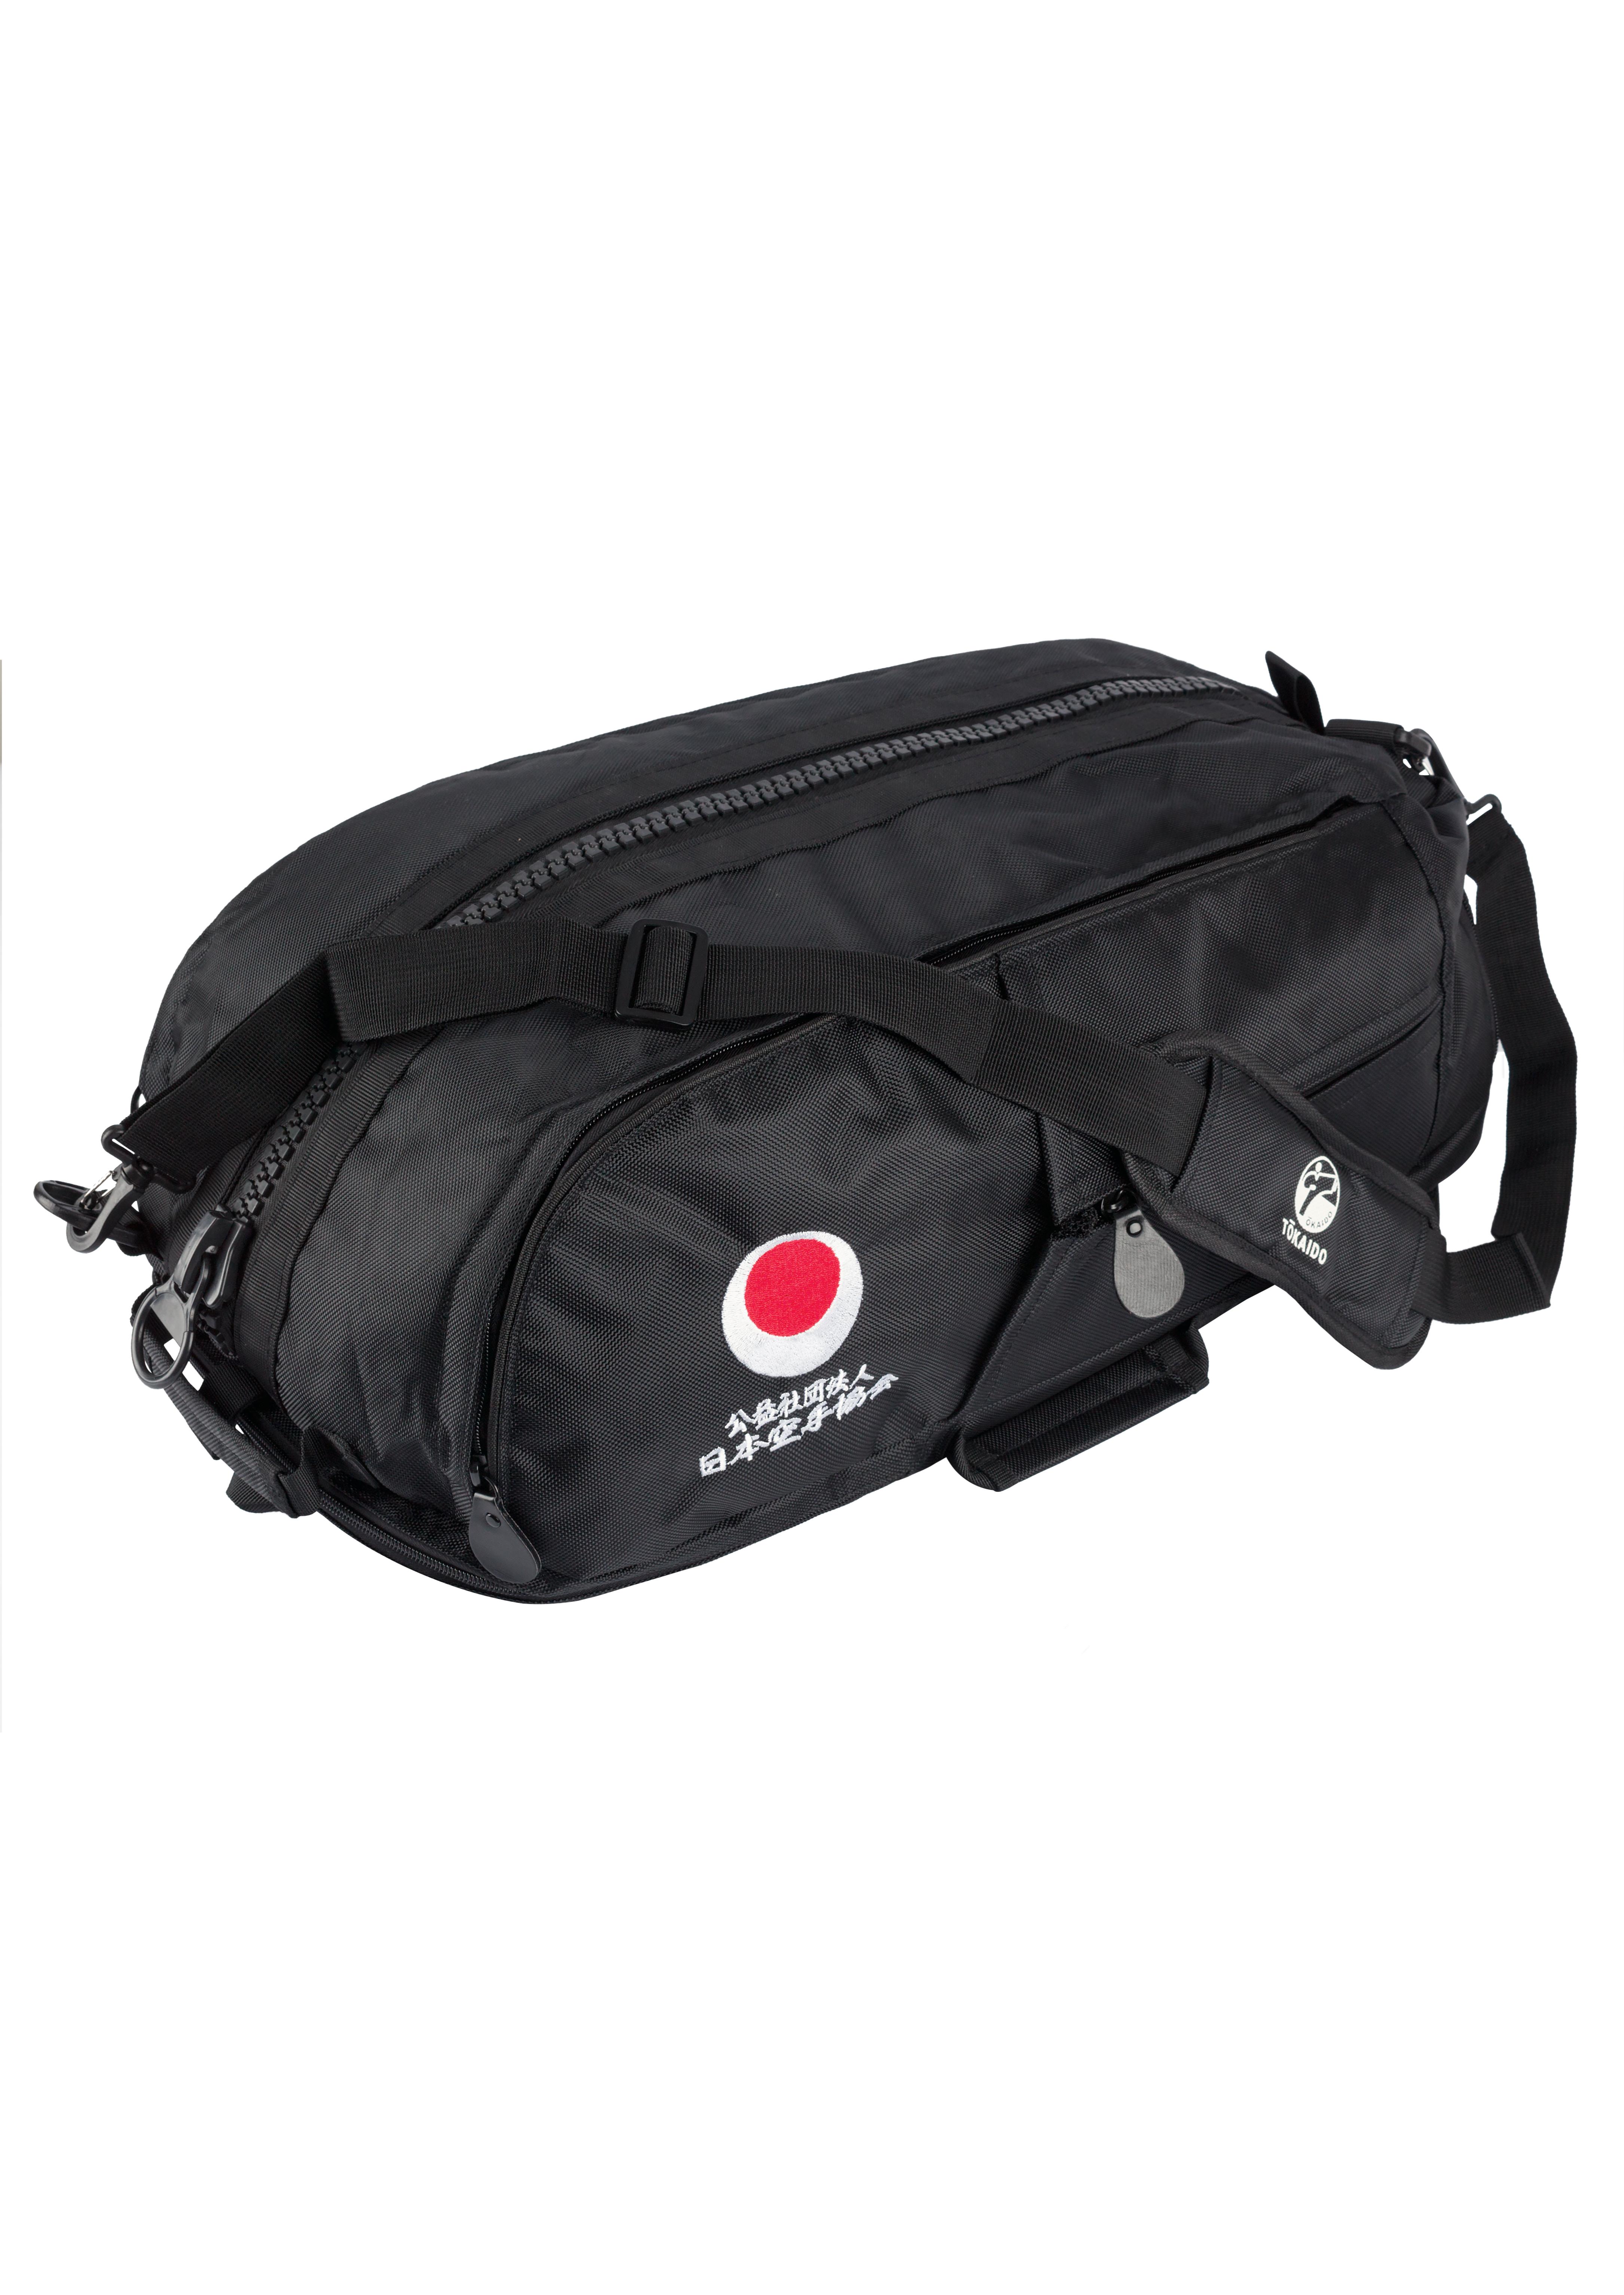 Zip Sports Jka Karate BagTokaido hxrCtsQd